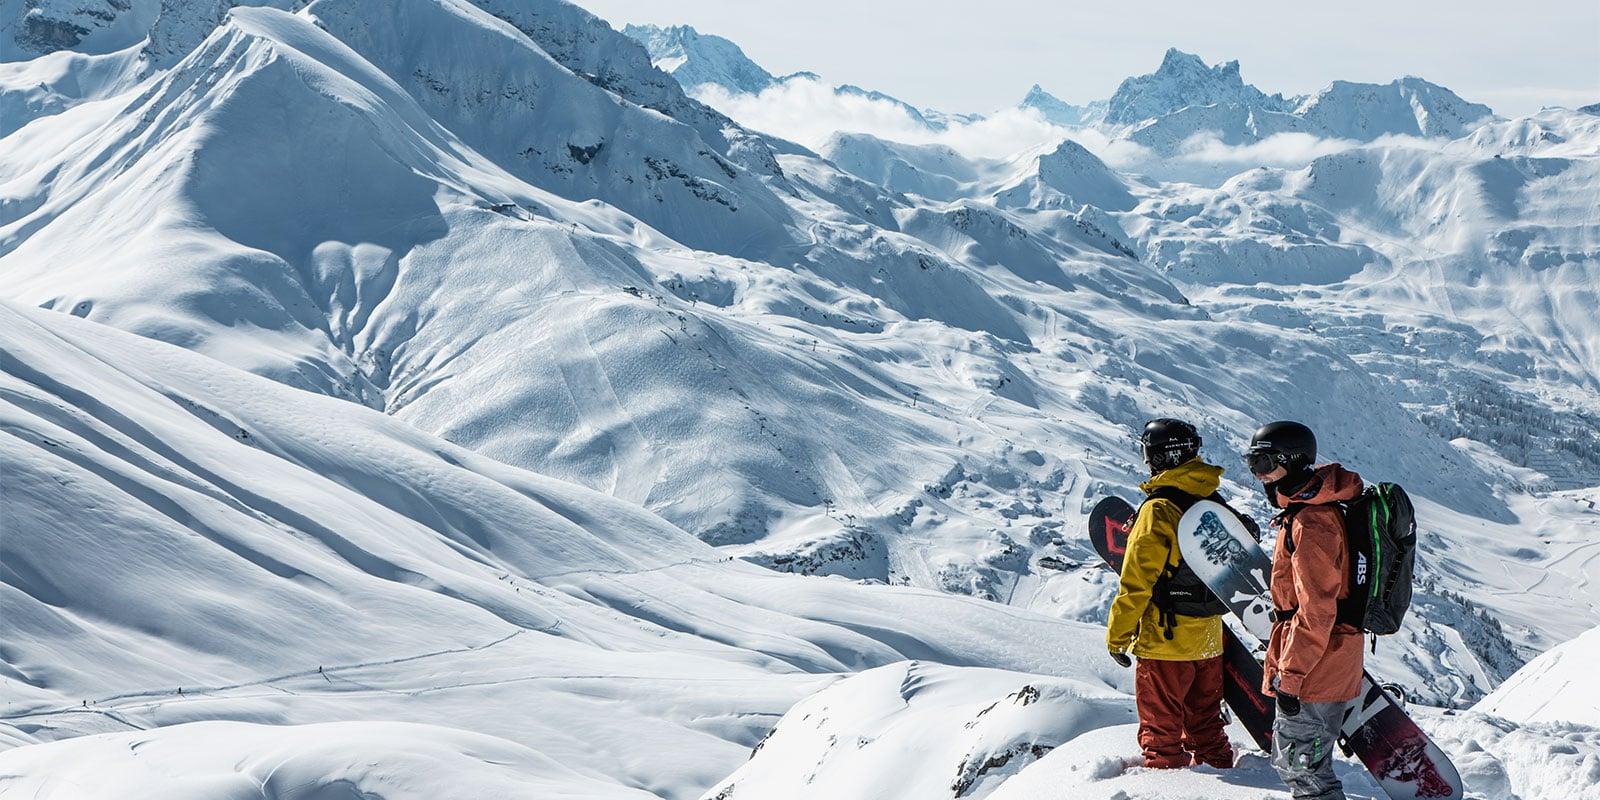 skifahren-titelbild2-christoph-schoech-lech-zuers-tourismus